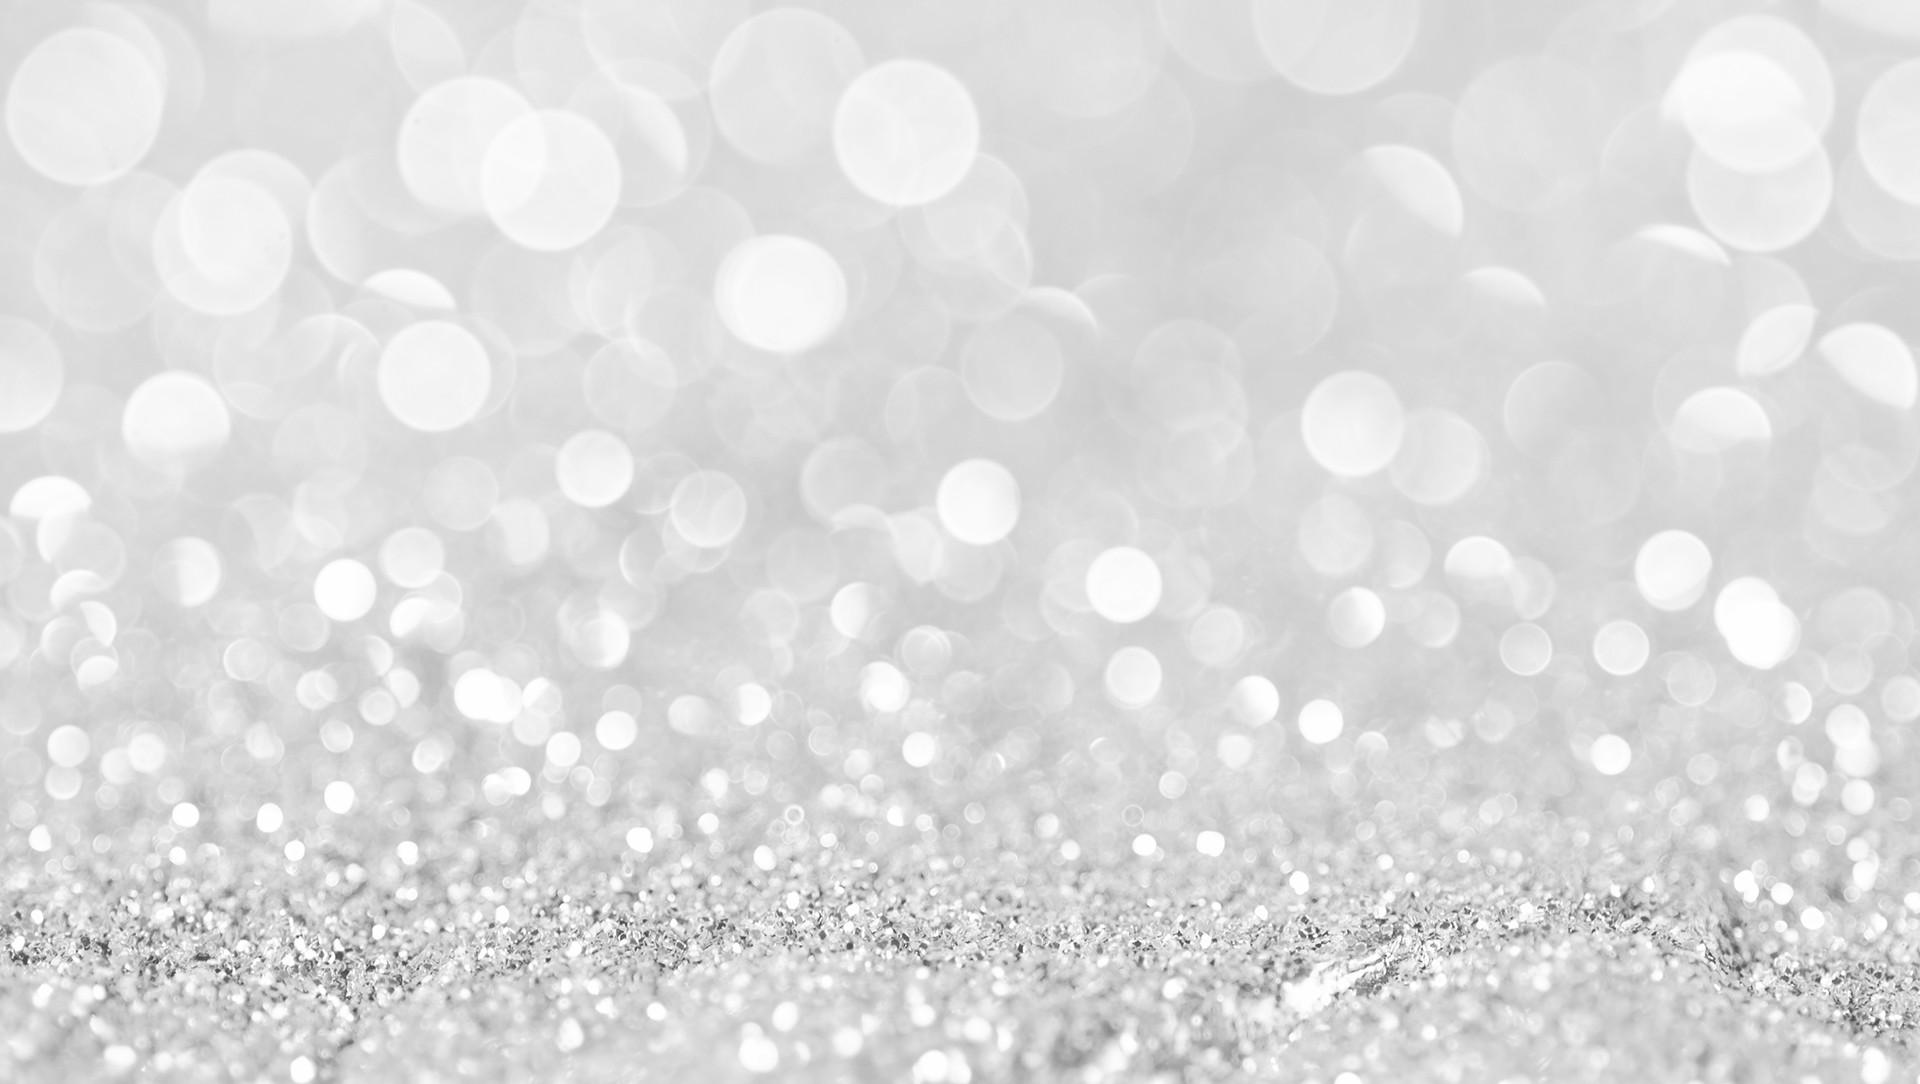 glitter background images  u00b7 u2460 wallpapertag